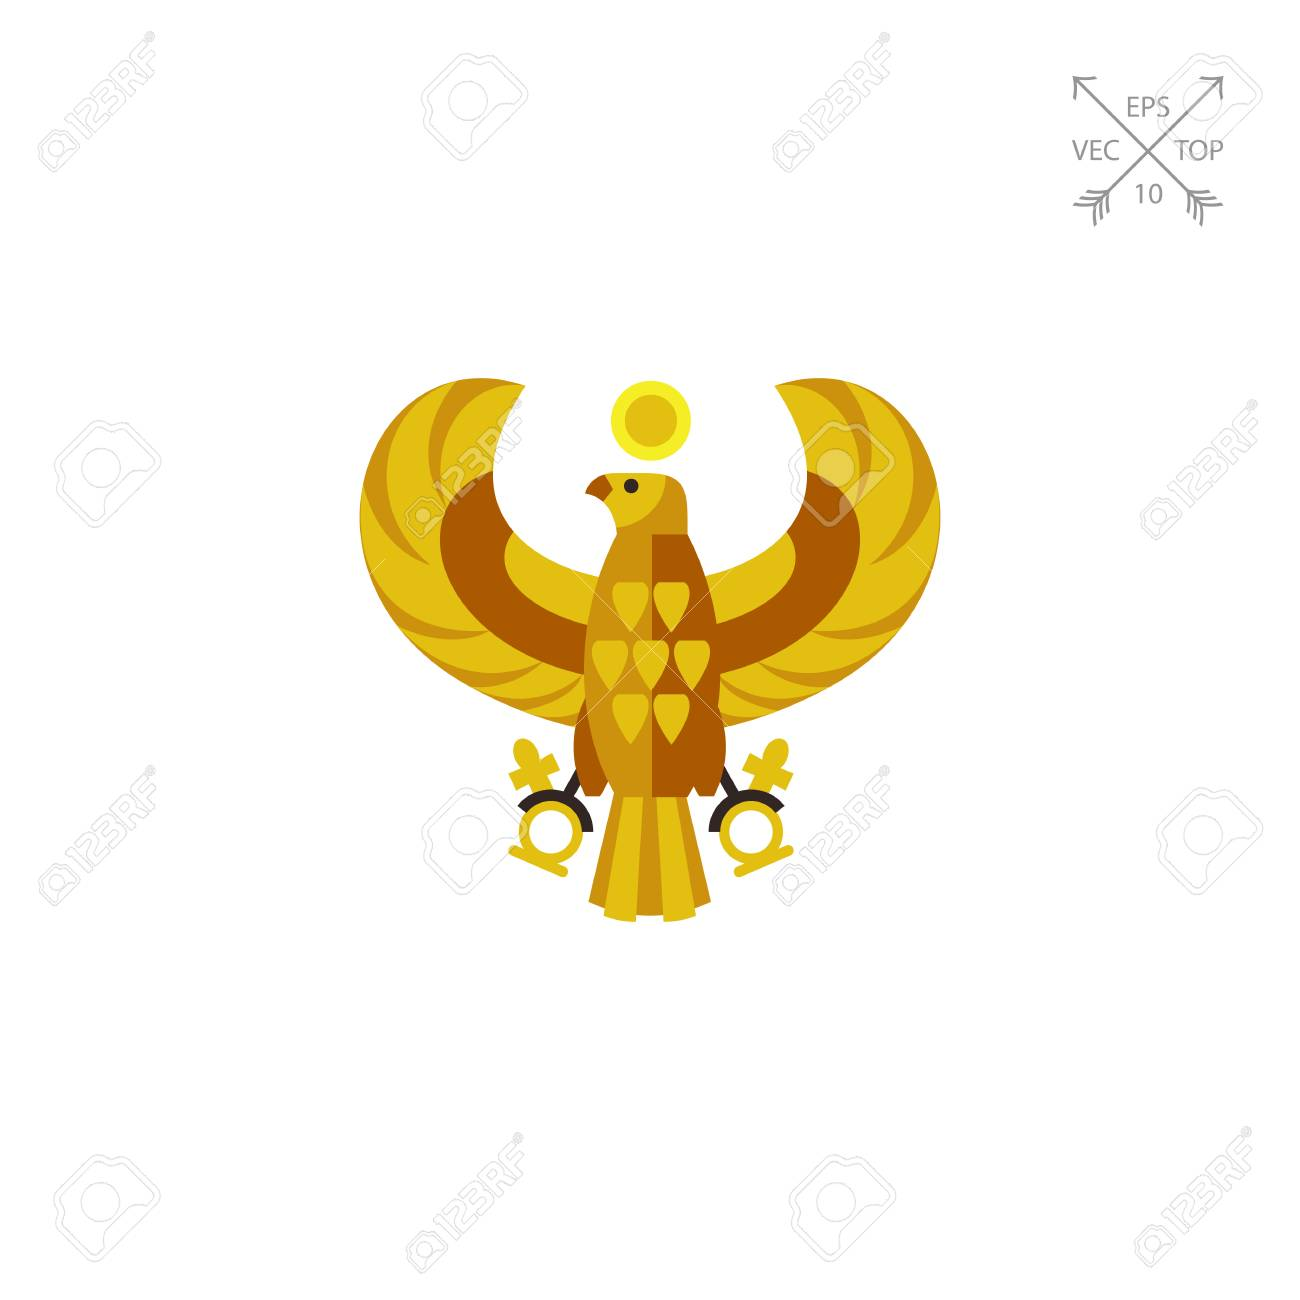 Egyptian horus falcon vector icon royalty free cliparts vectors egyptian horus falcon vector icon stock vector 75021348 biocorpaavc Images